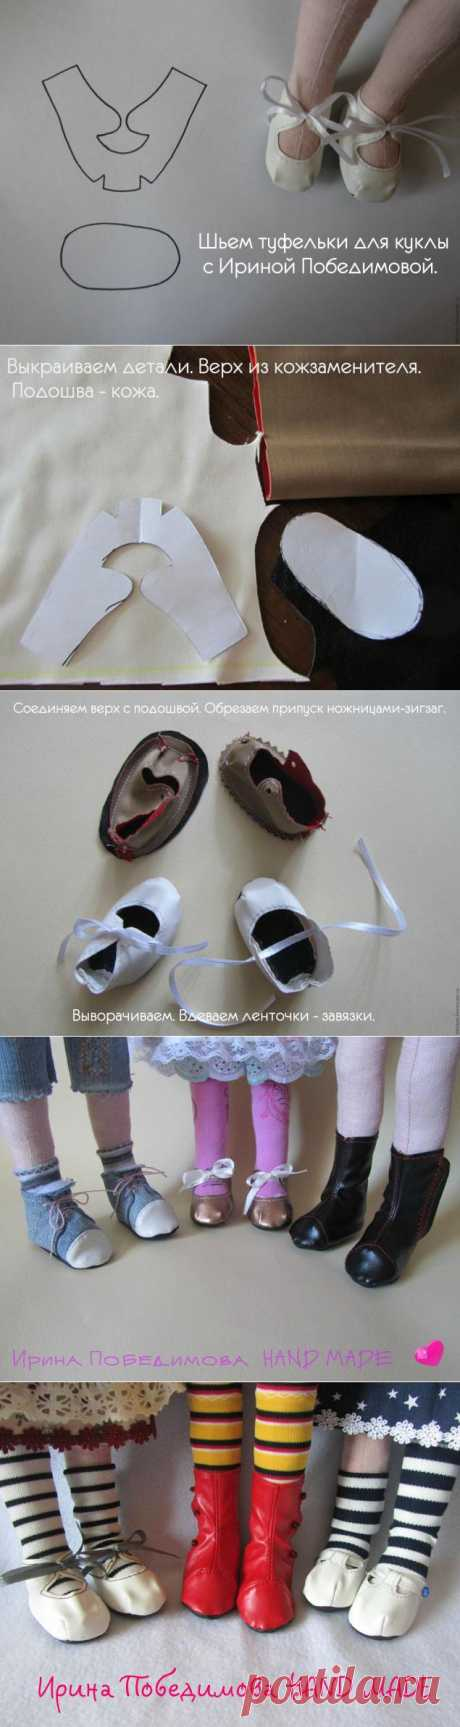 Туфельки для куклы. - Ярмарка Мастеров - ручная работа, handmade